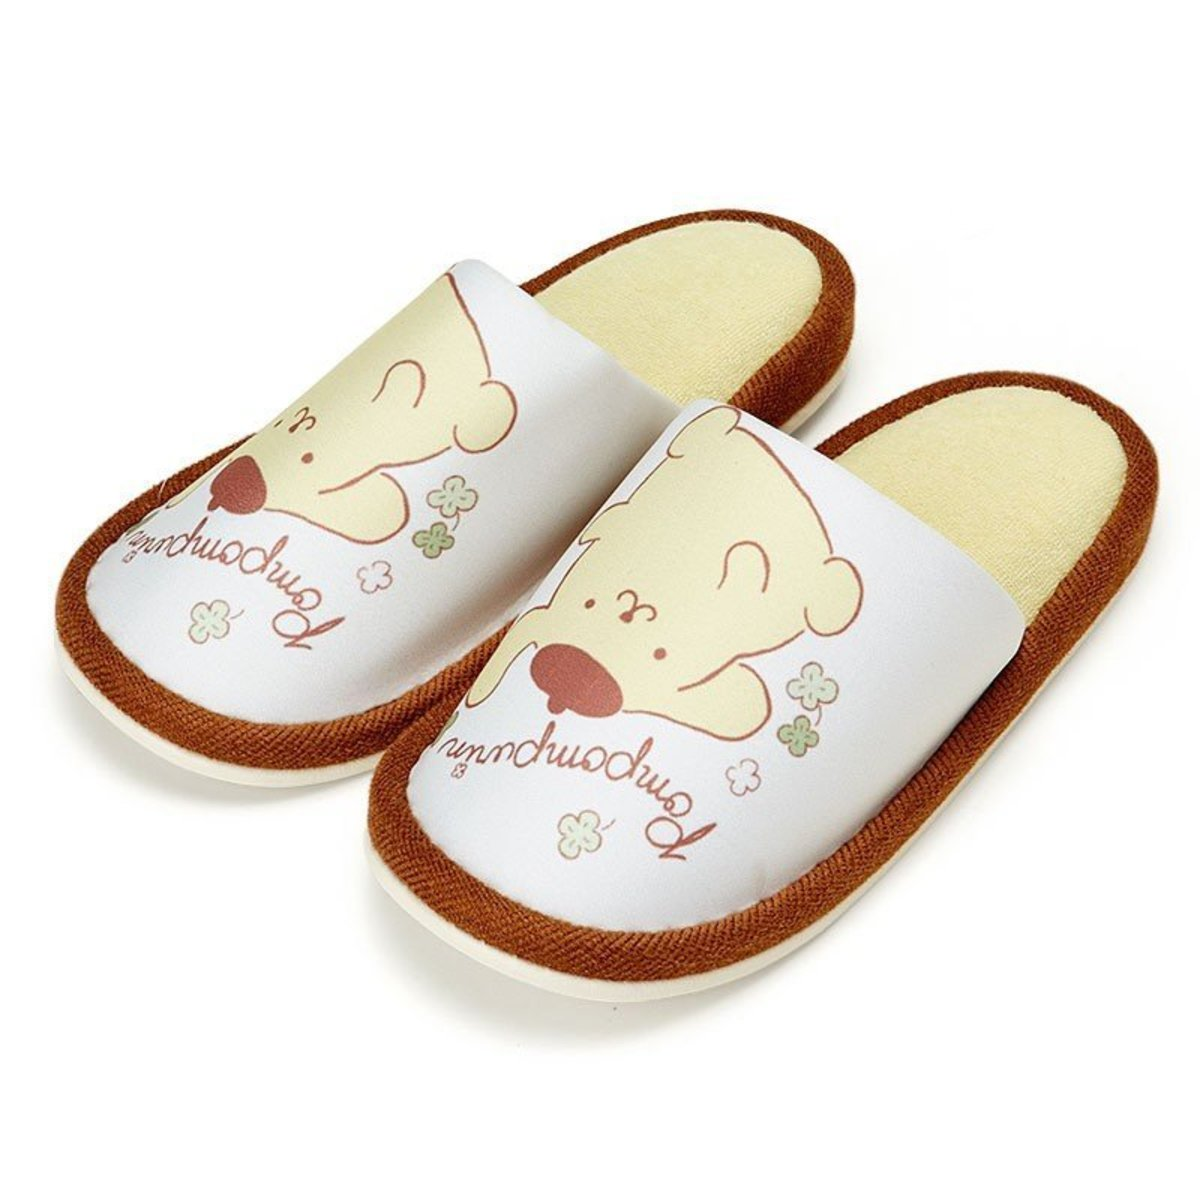 (Pompompurin) 日本Sanrio可愛卡通布拖鞋